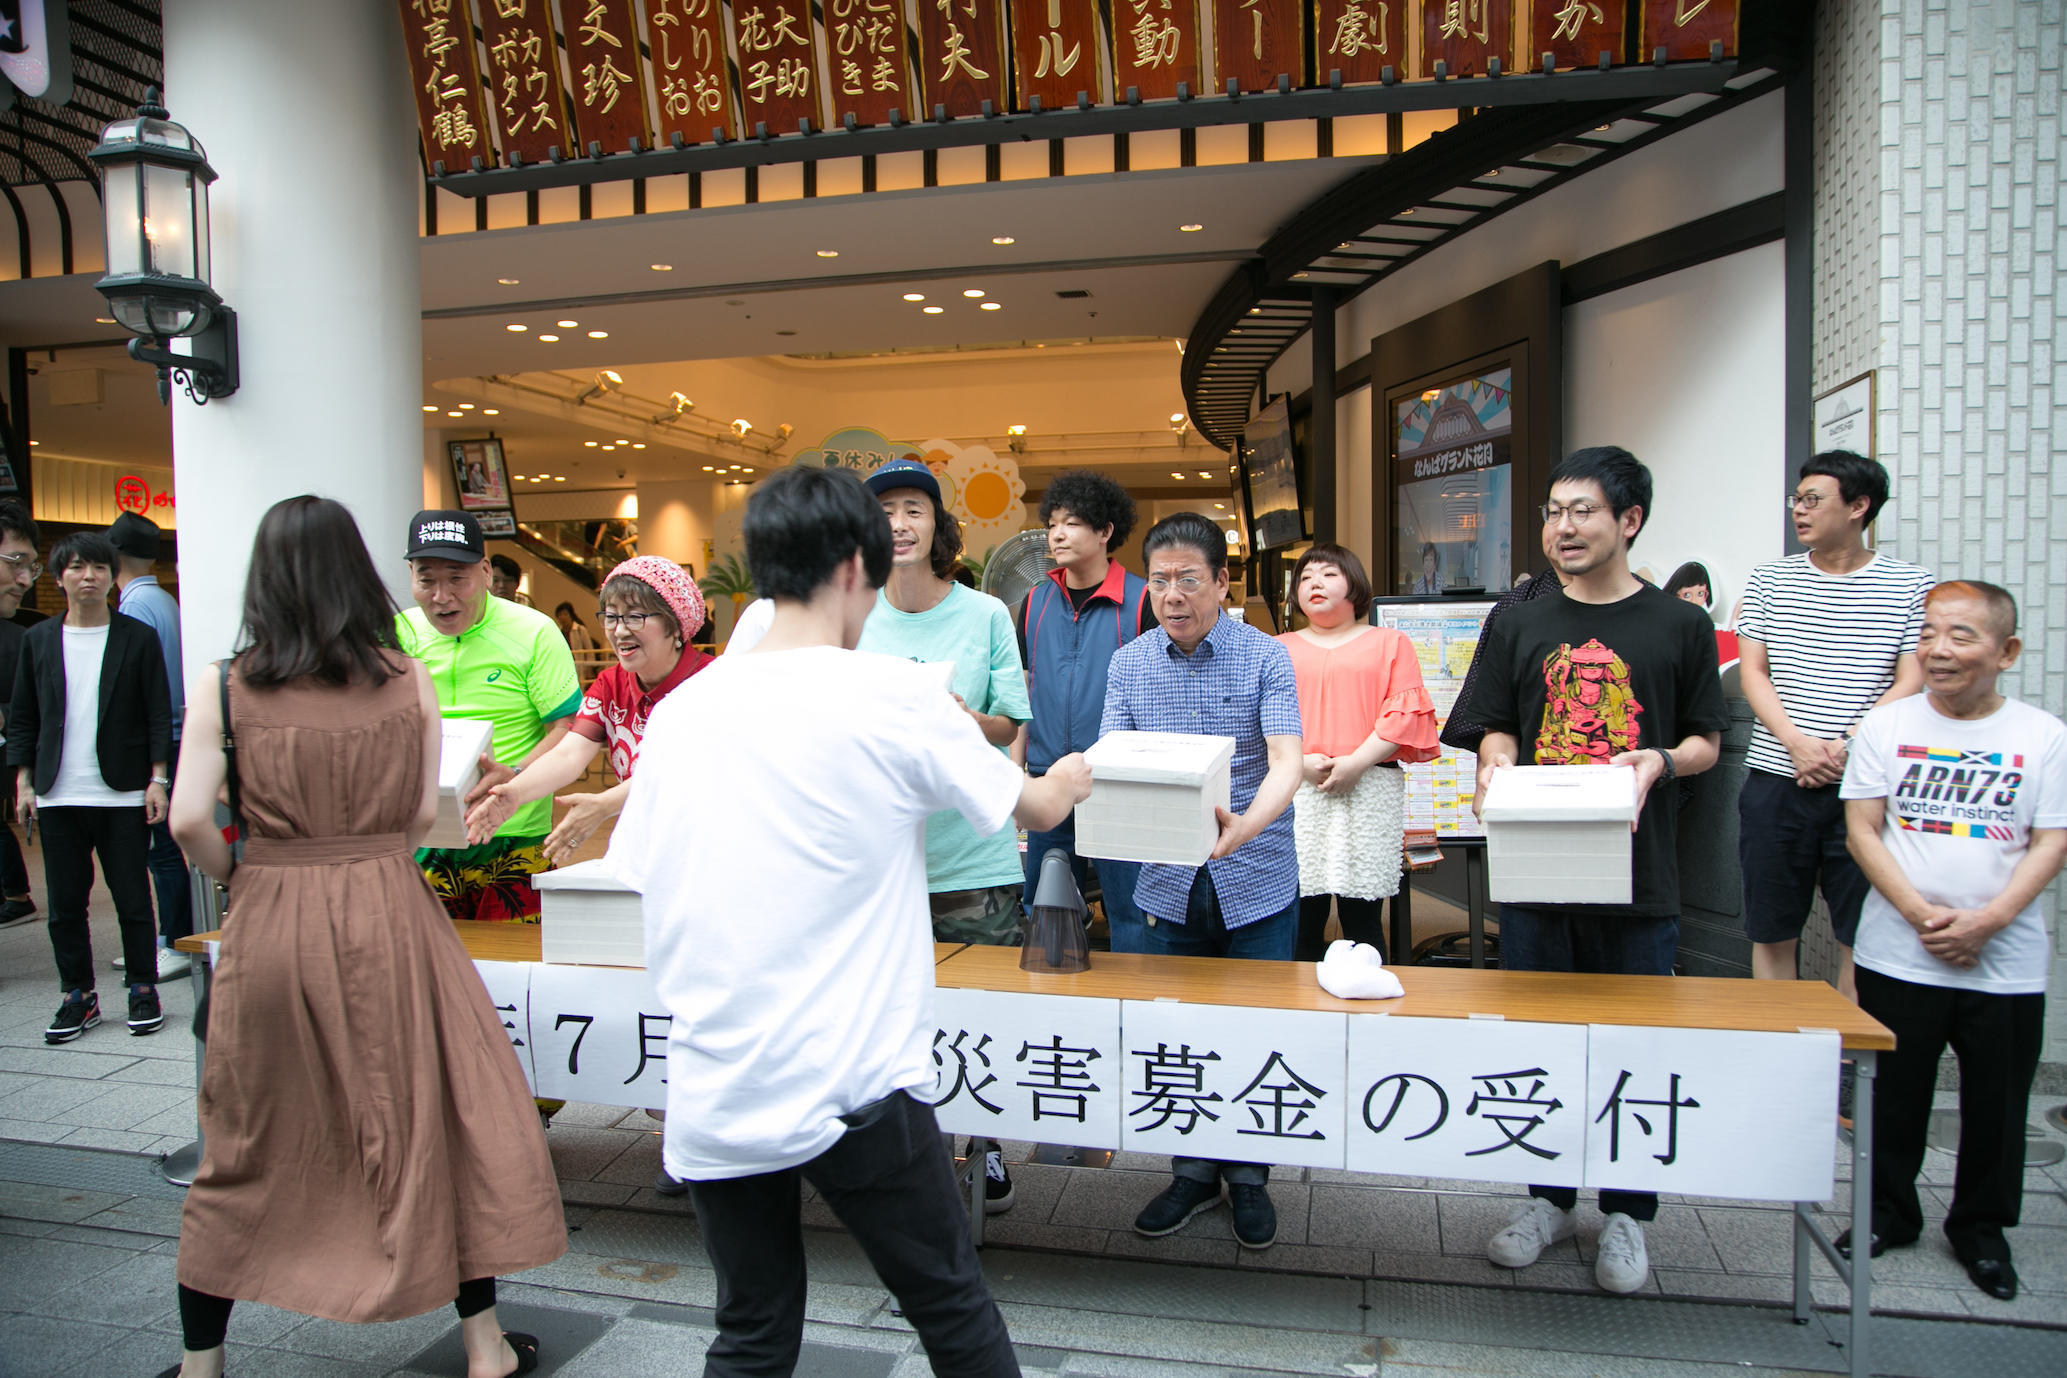 http://news.yoshimoto.co.jp/20180717224154-94551067d22432d34dbde87ae897e5d9e839152b.jpg